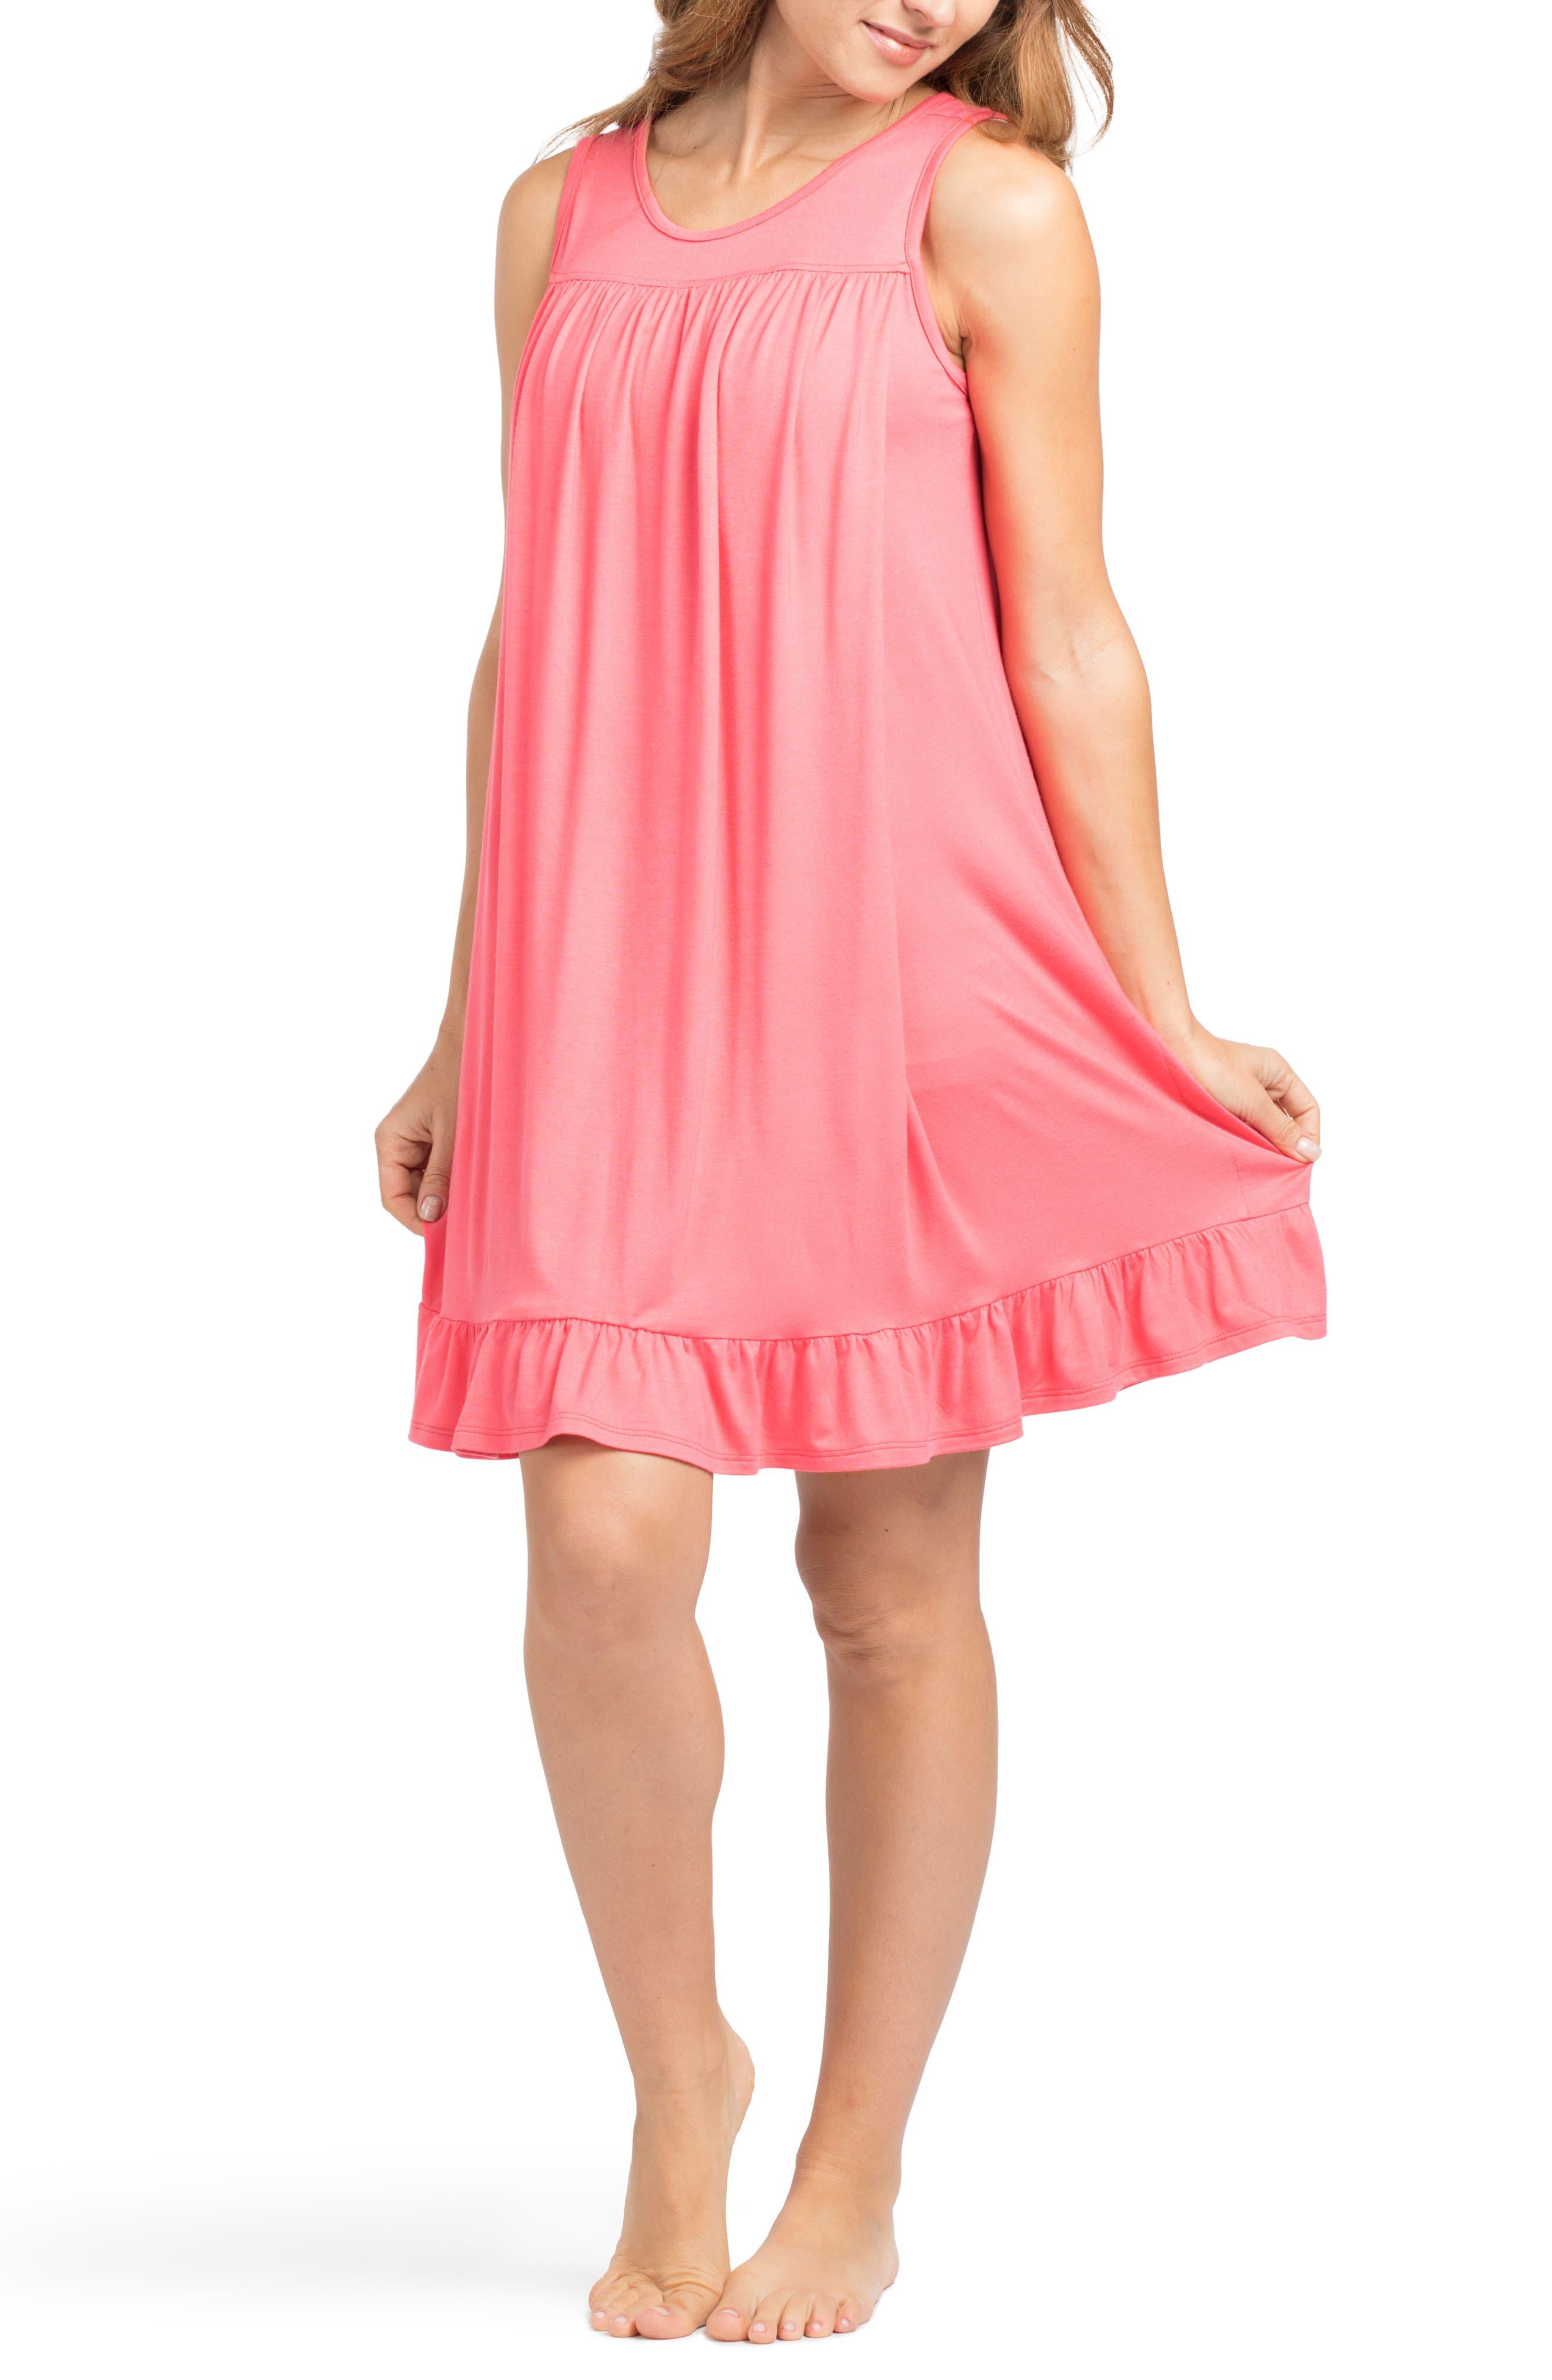 Main Image - Savi Mom 'The Ruffled' Sleeveless Maternity/Nursing Nightgown